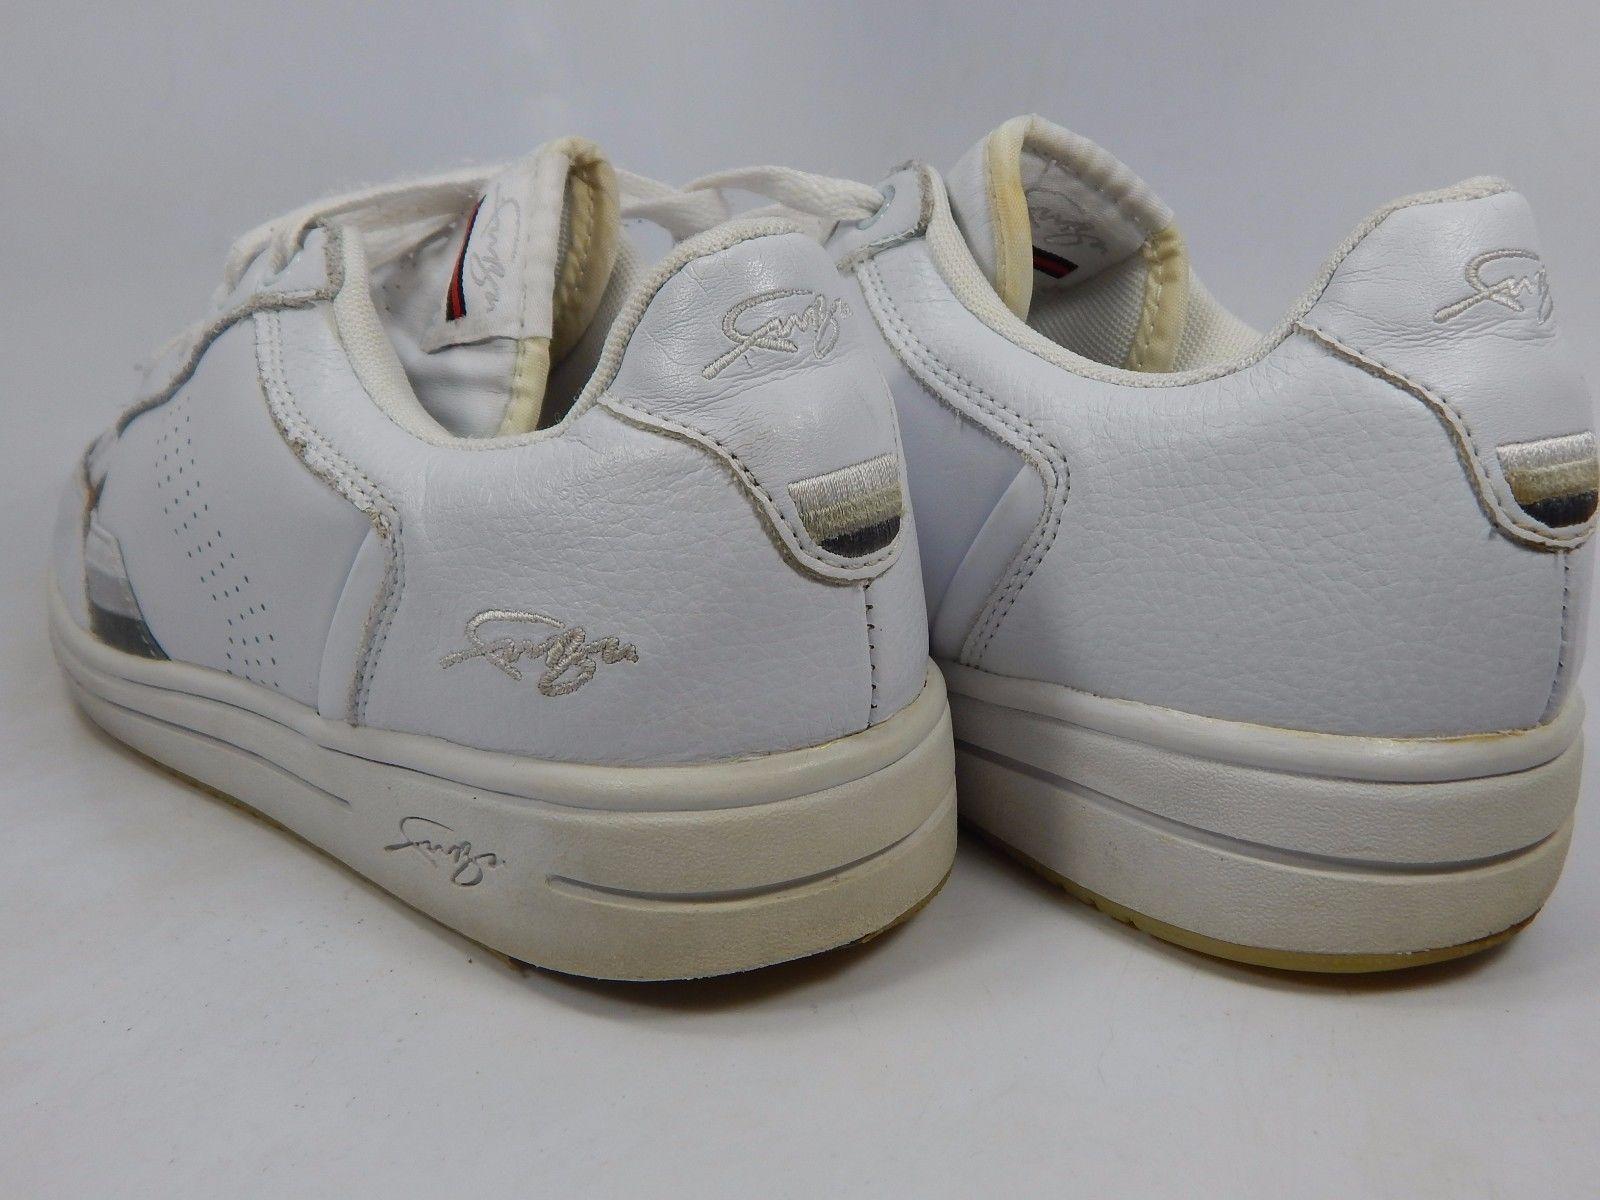 Fubu Women's Athletic Sneakers Shoes Size US 9 M (B) EU 41.5 White